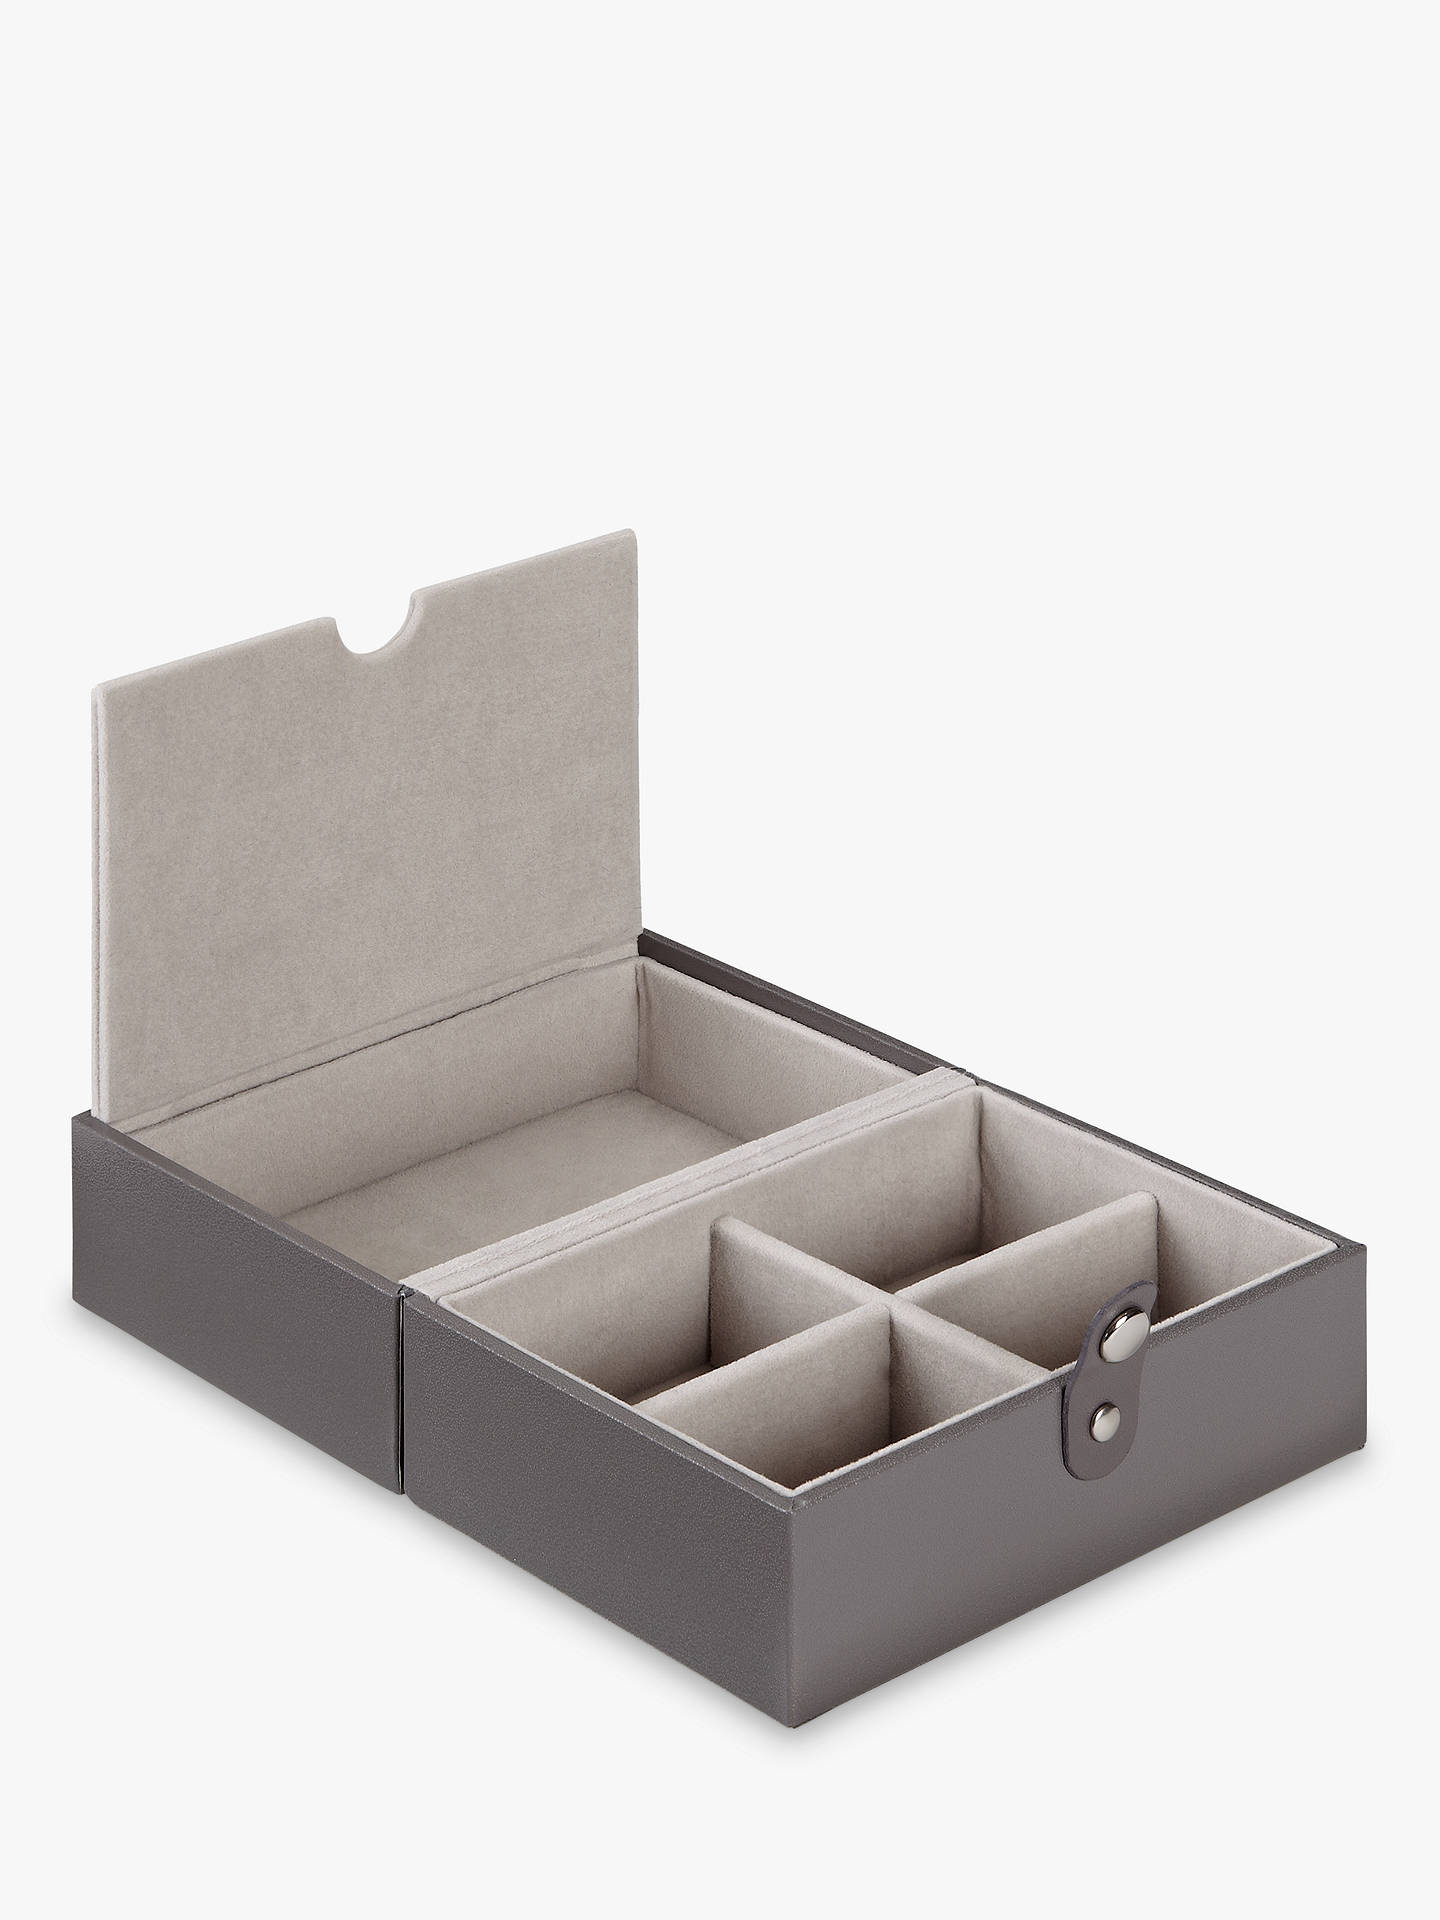 Lc Designs Travel Jewellery Box Tray Mink Grey Velvet